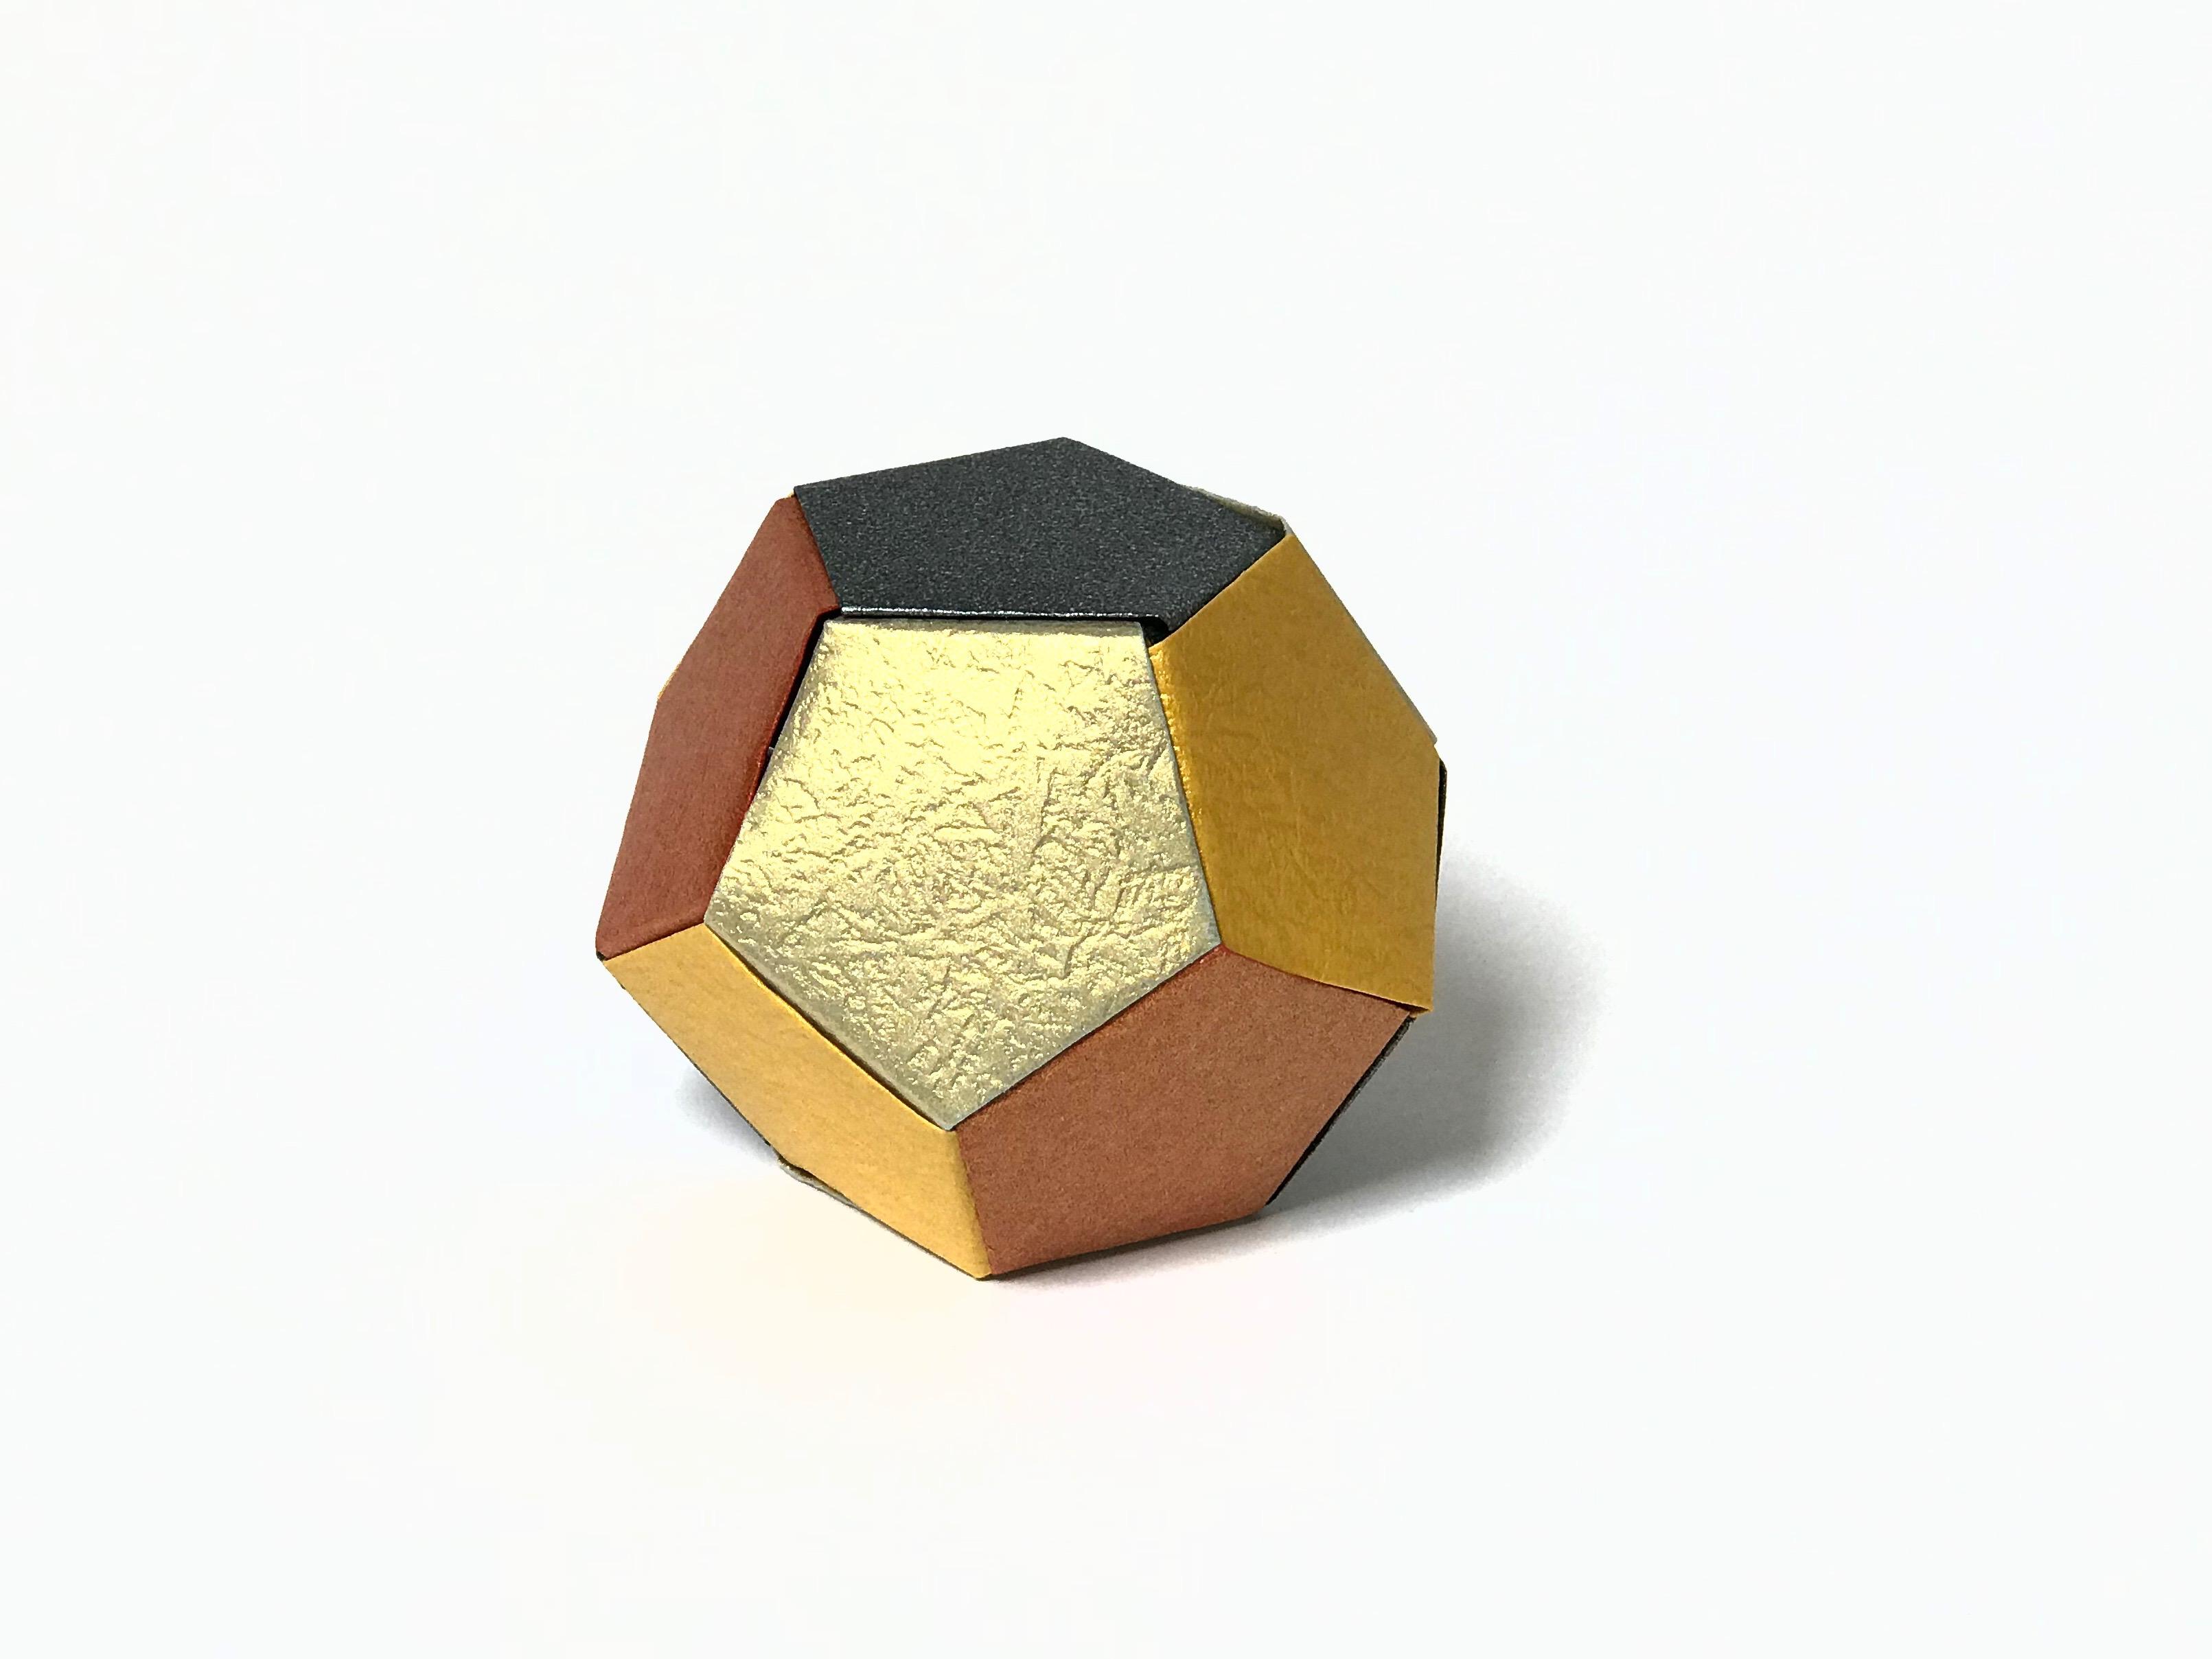 Origami Soccer Ball Diagram Explained Wiring Diagrams Modular New David Brill S Vallebird Files Wordpress Com 2018 08